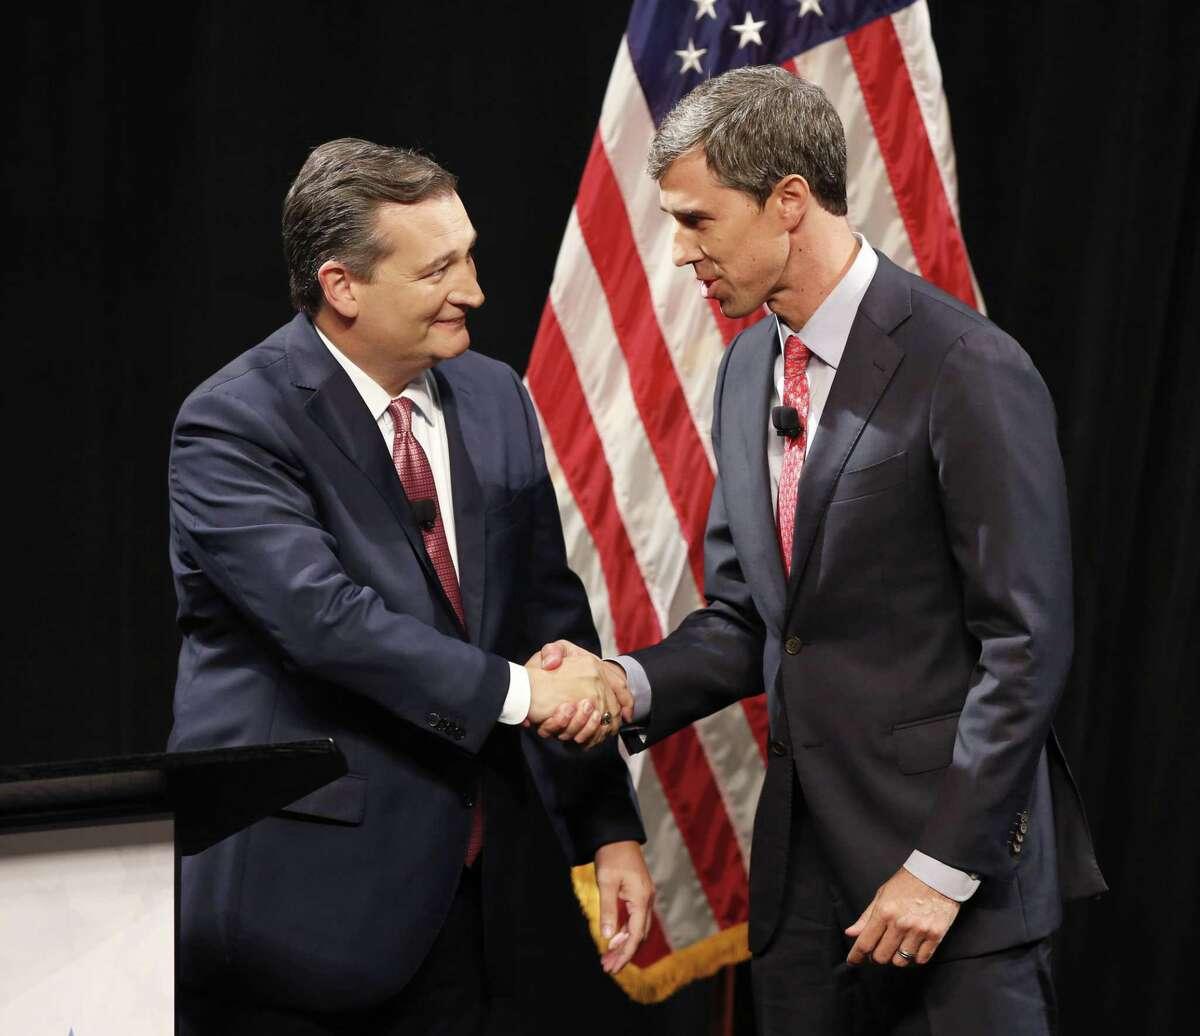 Republican U.S. Senator Ted Cruz, left, and Democratic U.S. Representative Beto O'Rourke, right, shake hands before their first debate for the Texas U.S. Senate in Dallas, Friday Sept. 21, 2018. (Nathan Hunsinger/The Dallas Morning News via AP, Pool)